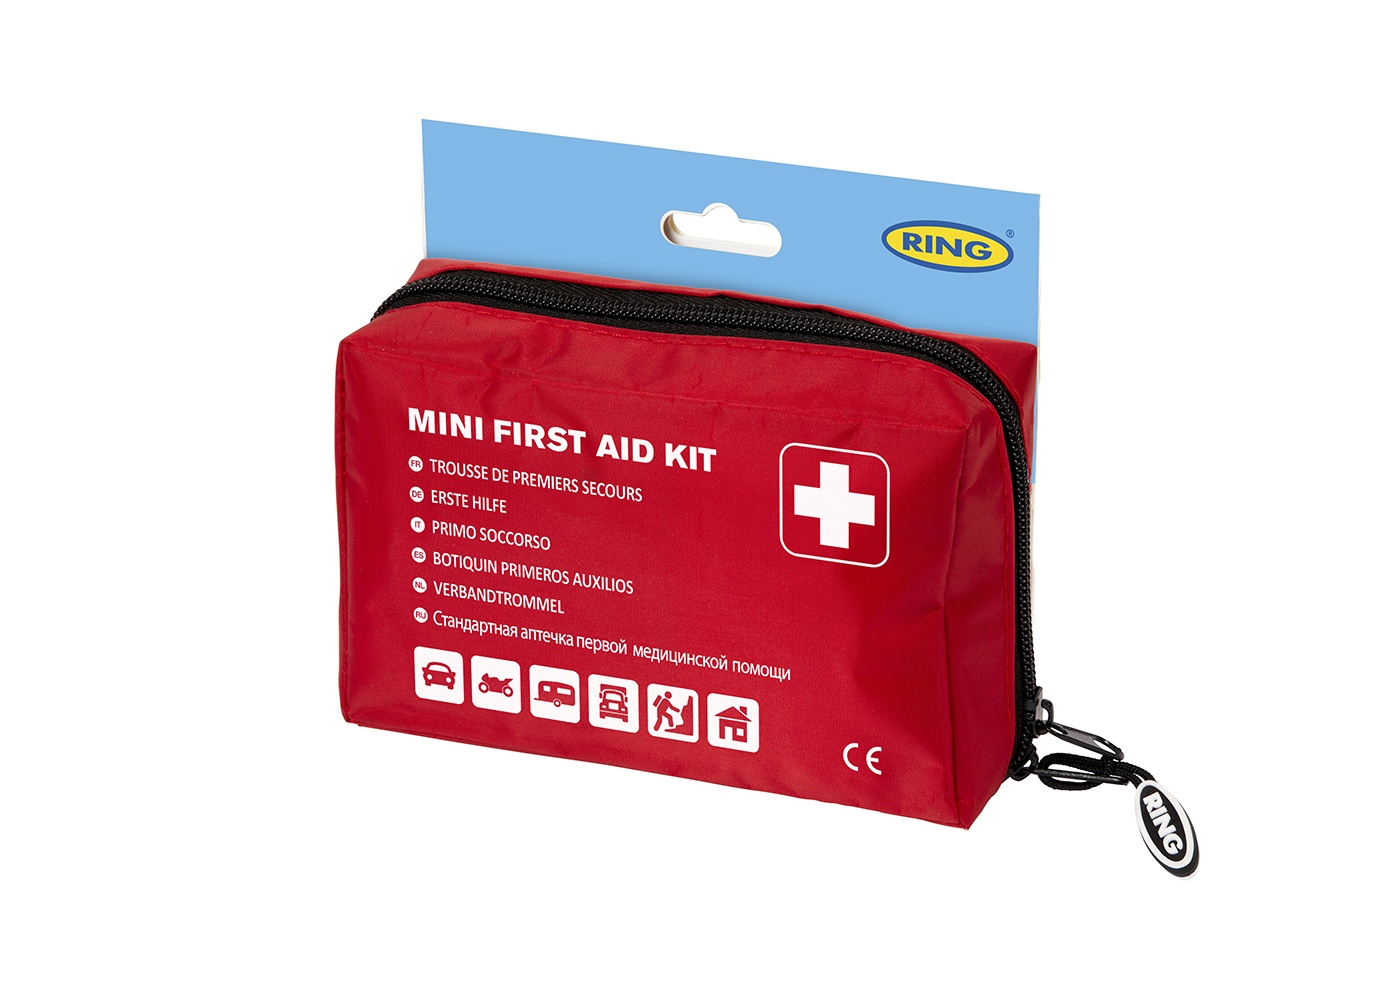 Emergency Essentials | Mini First Aid Kit | RCT12 | Ring